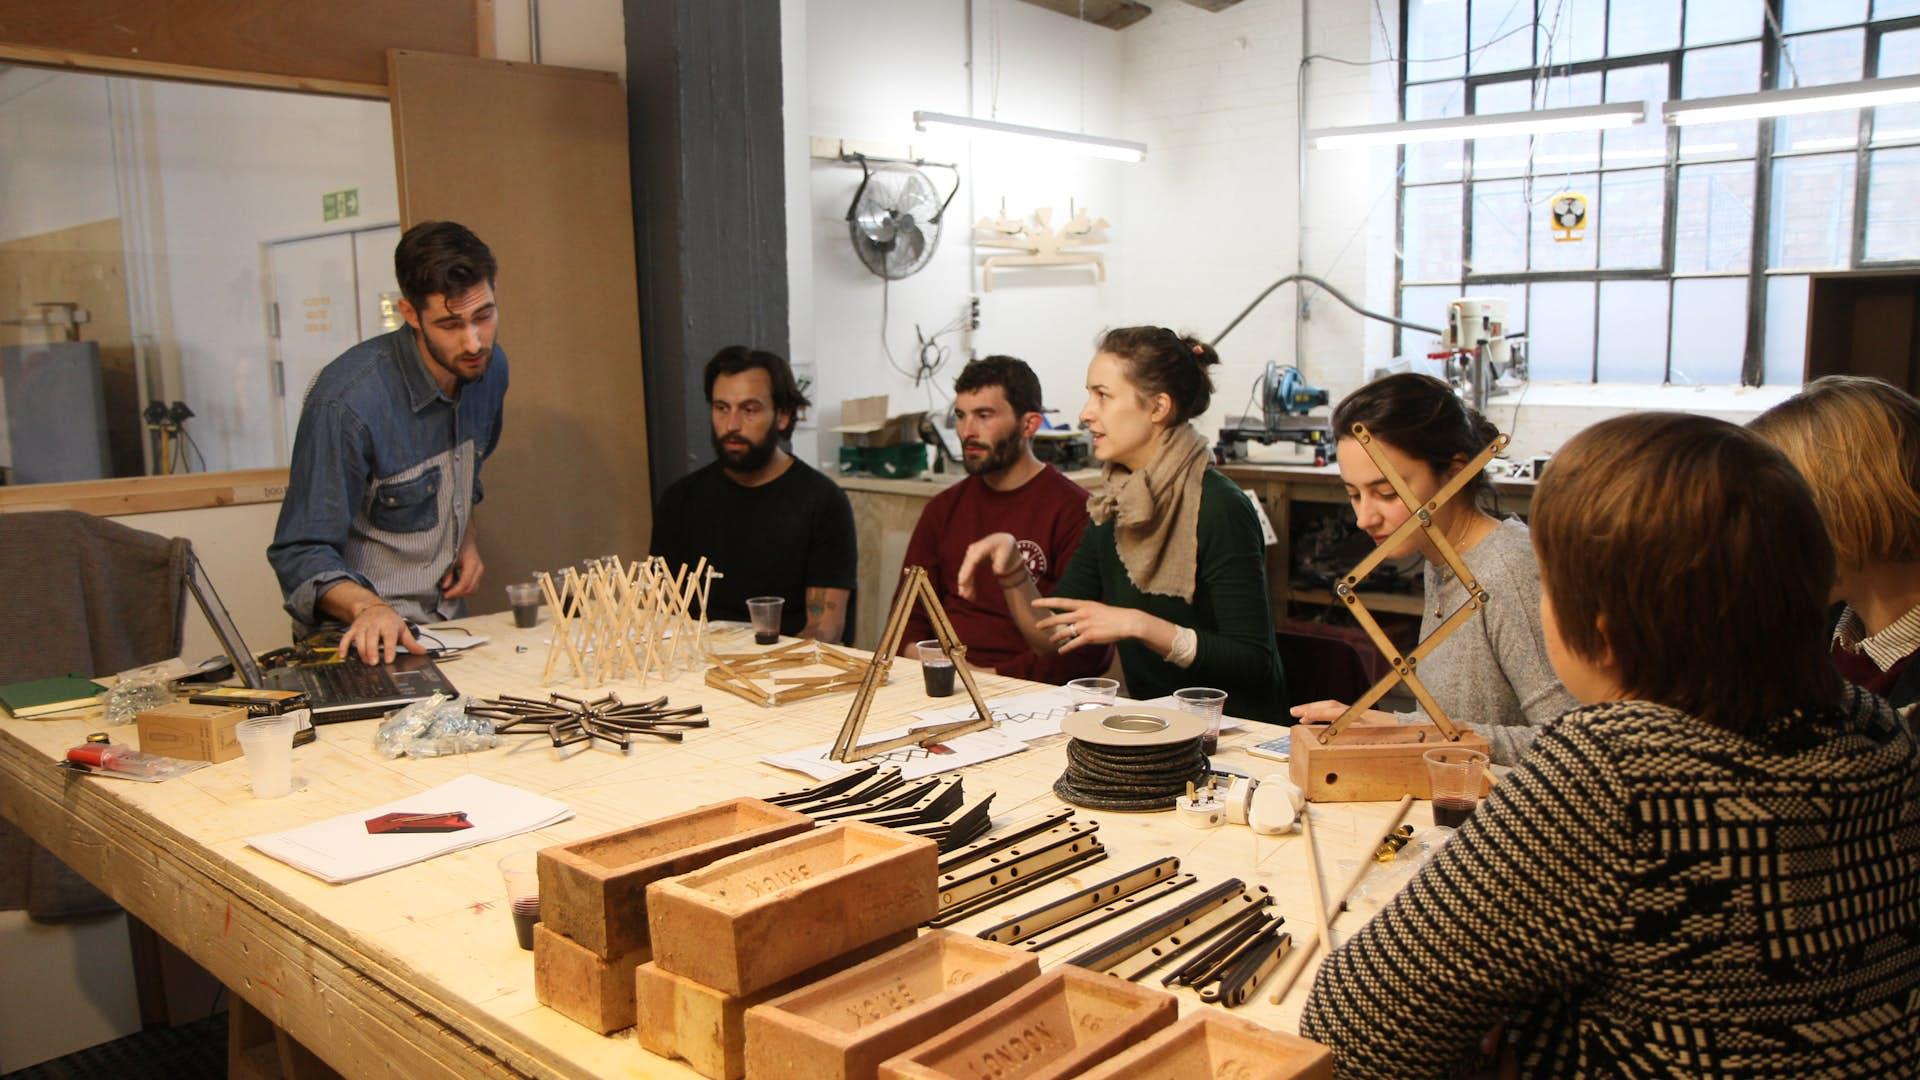 wood workshop   business   machines room maker space